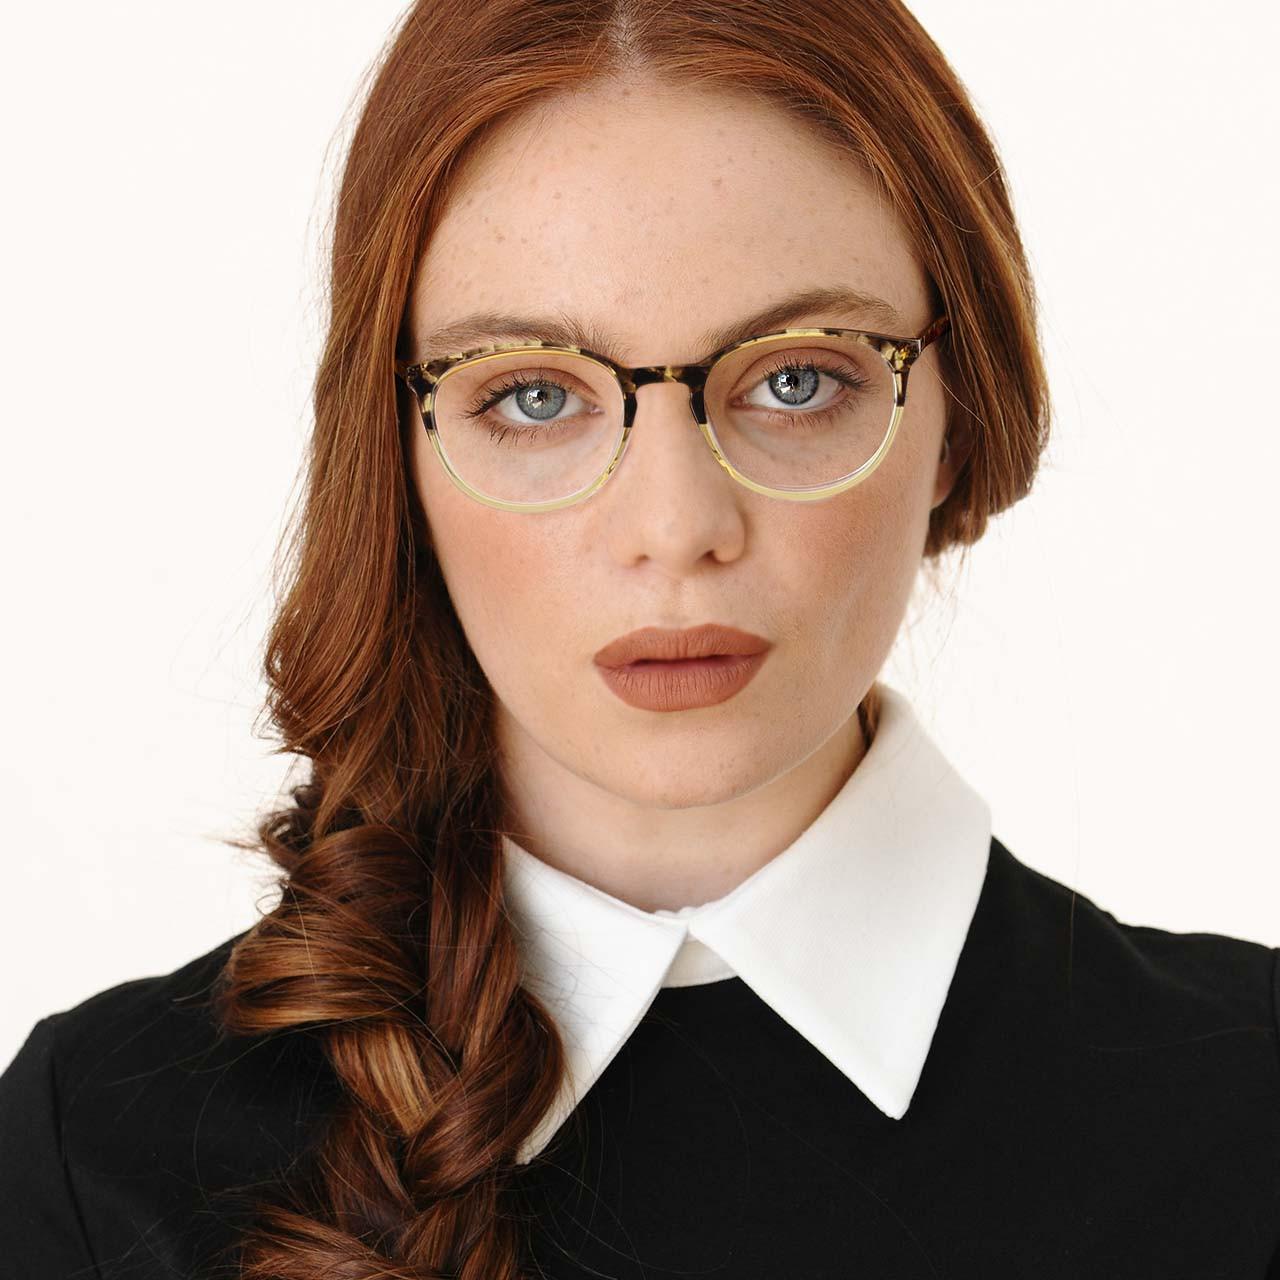 GEEK Eyewear Style Hipster Tortoise